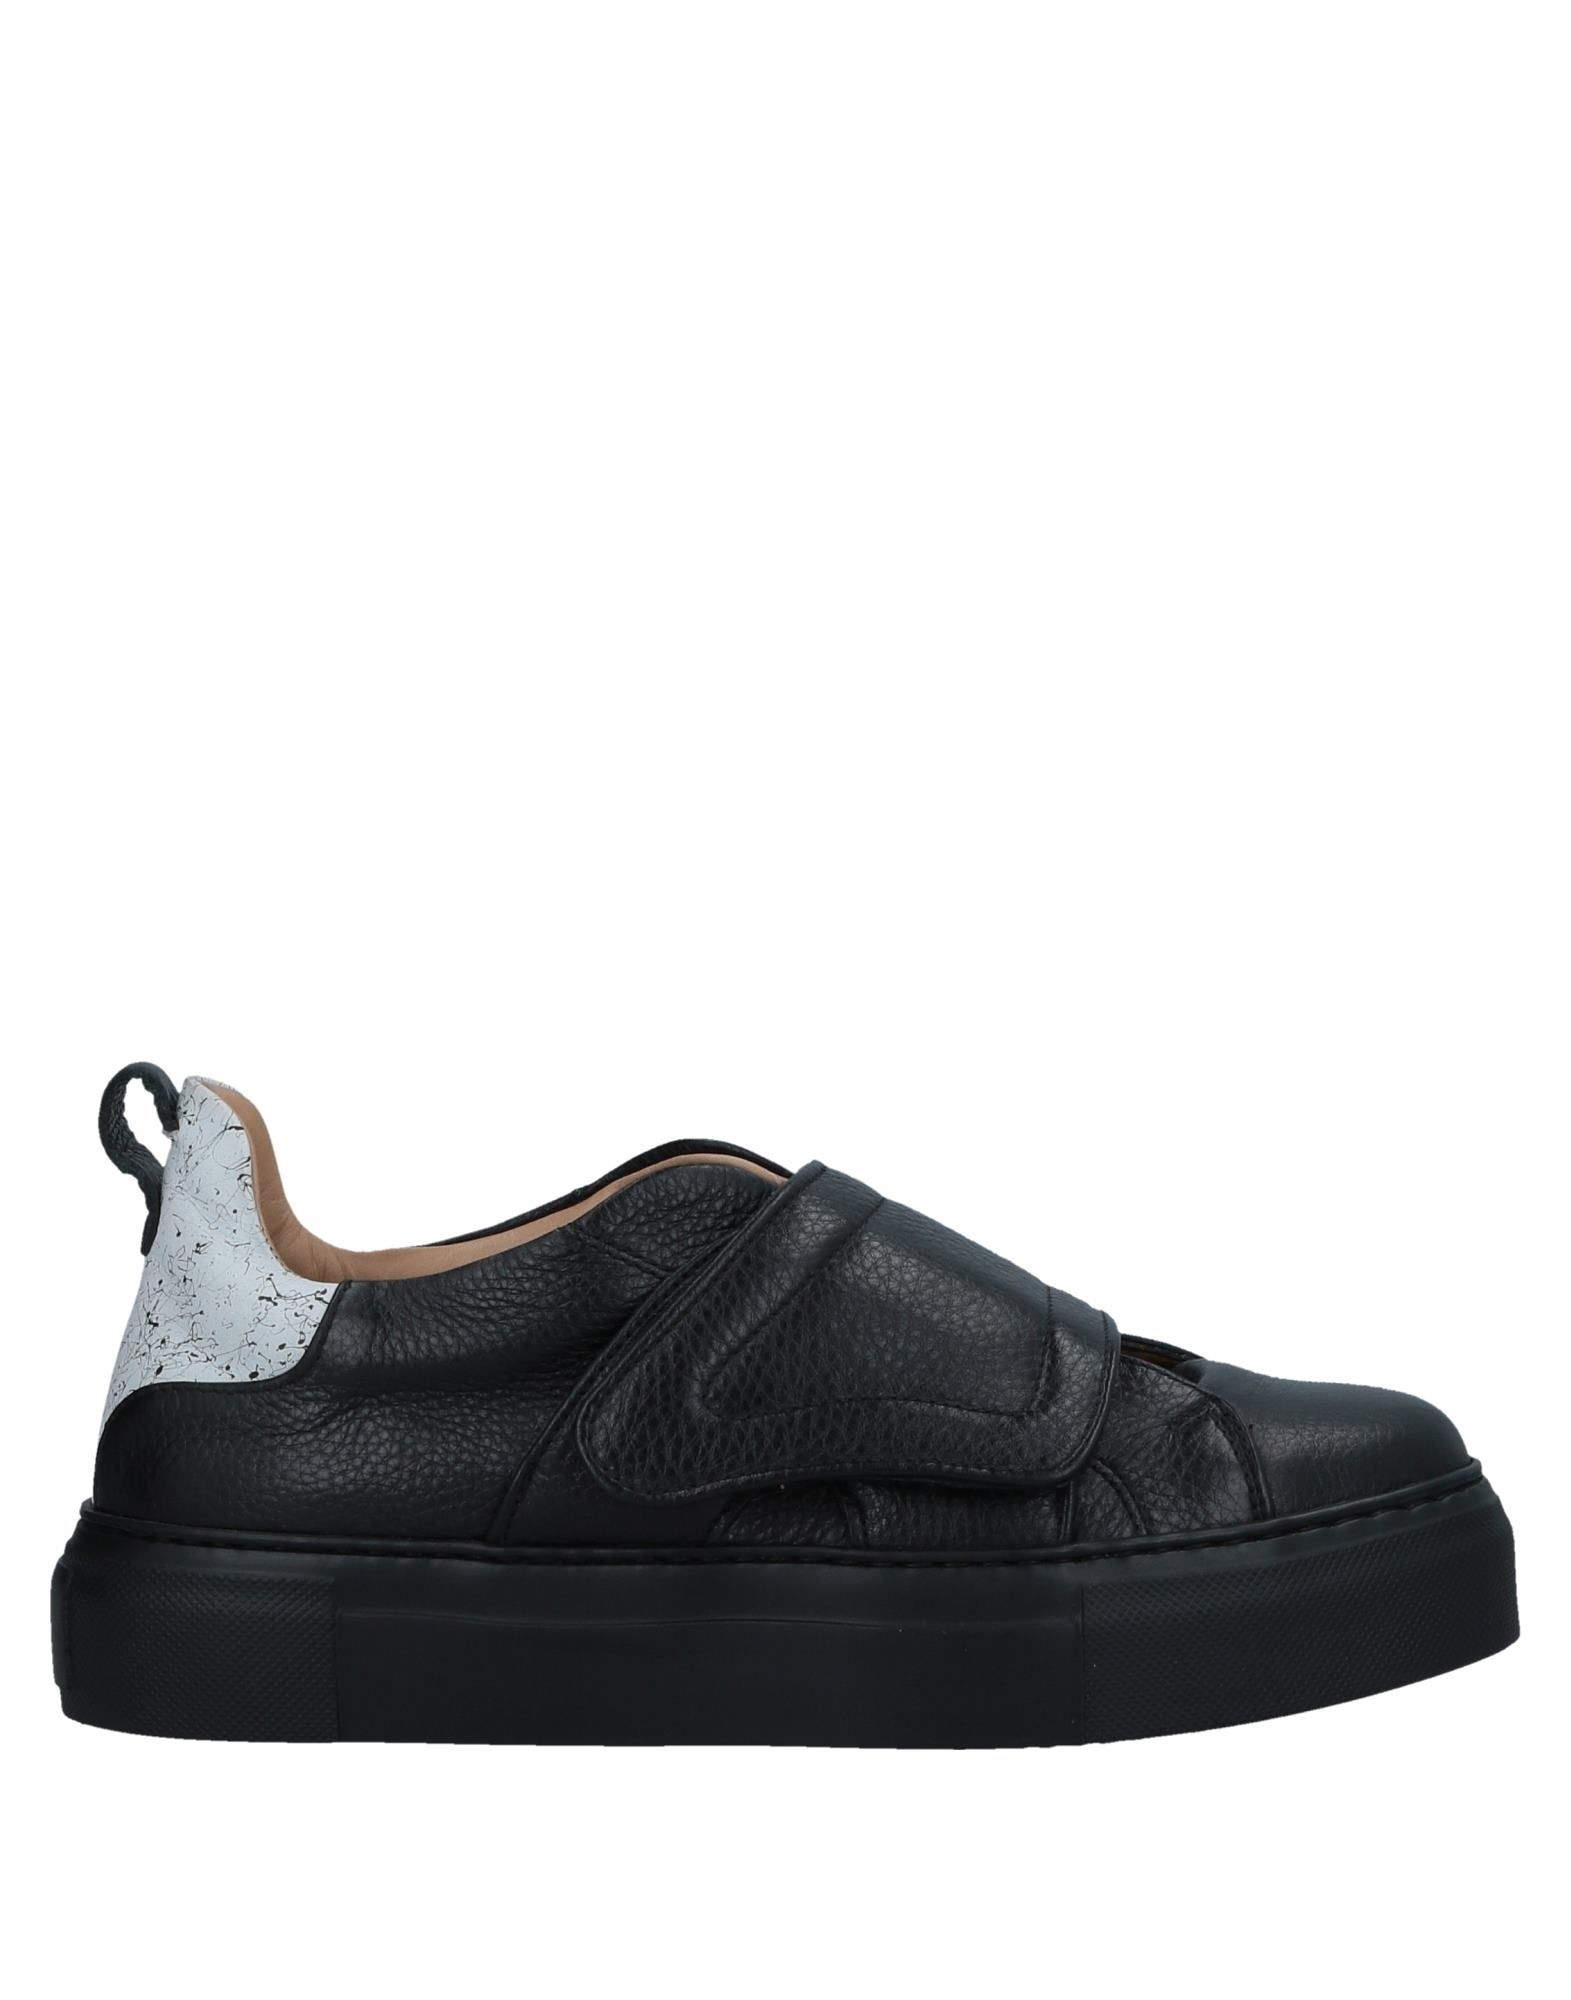 Sneakers 11532190WX Logan Crossing Donna - 11532190WX Sneakers 3d8844